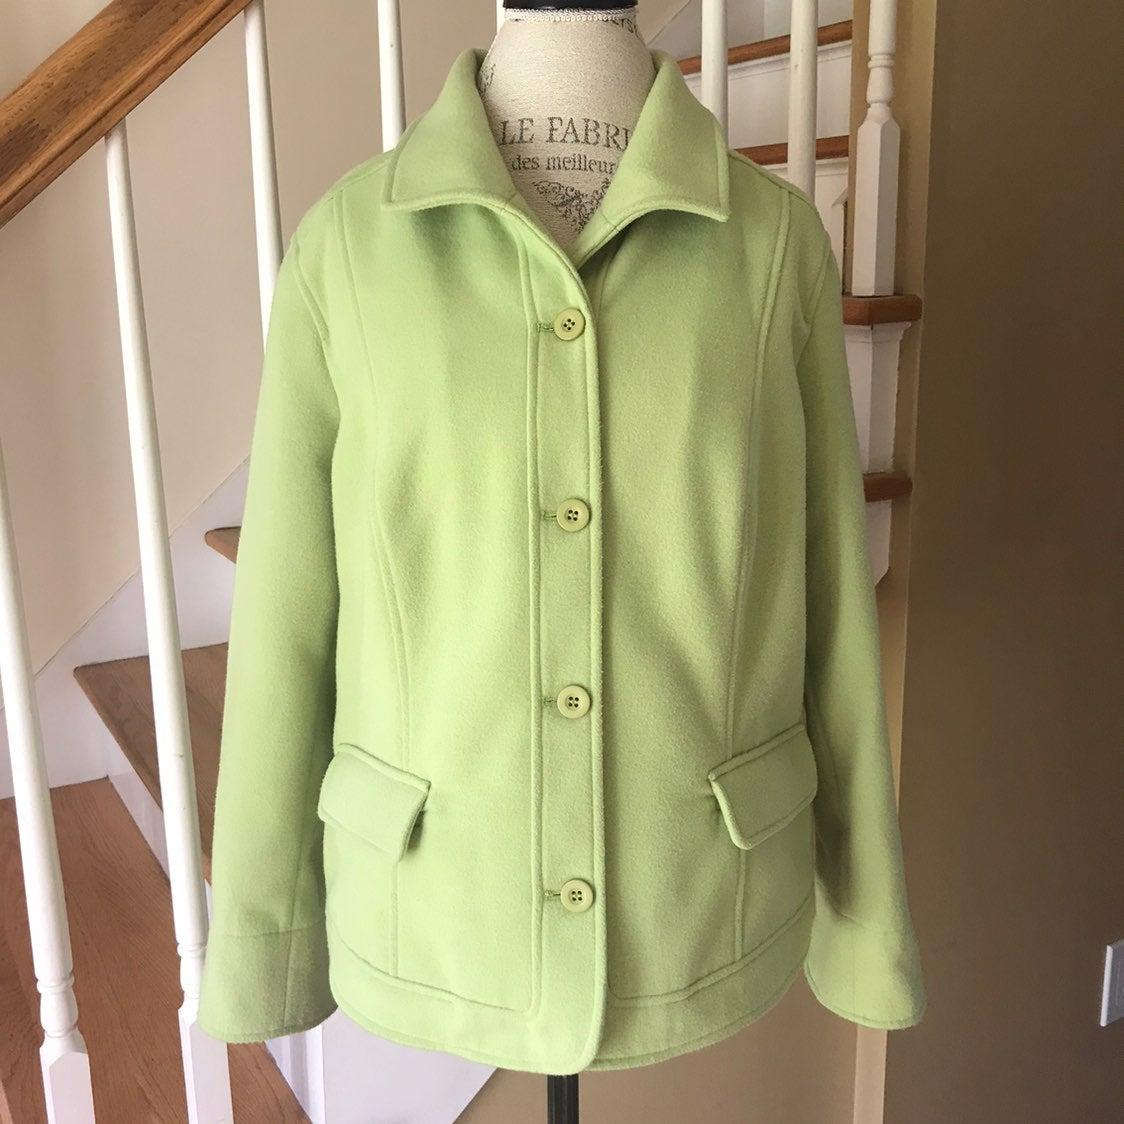 Chico's Chicos Light Green Felt Jacket